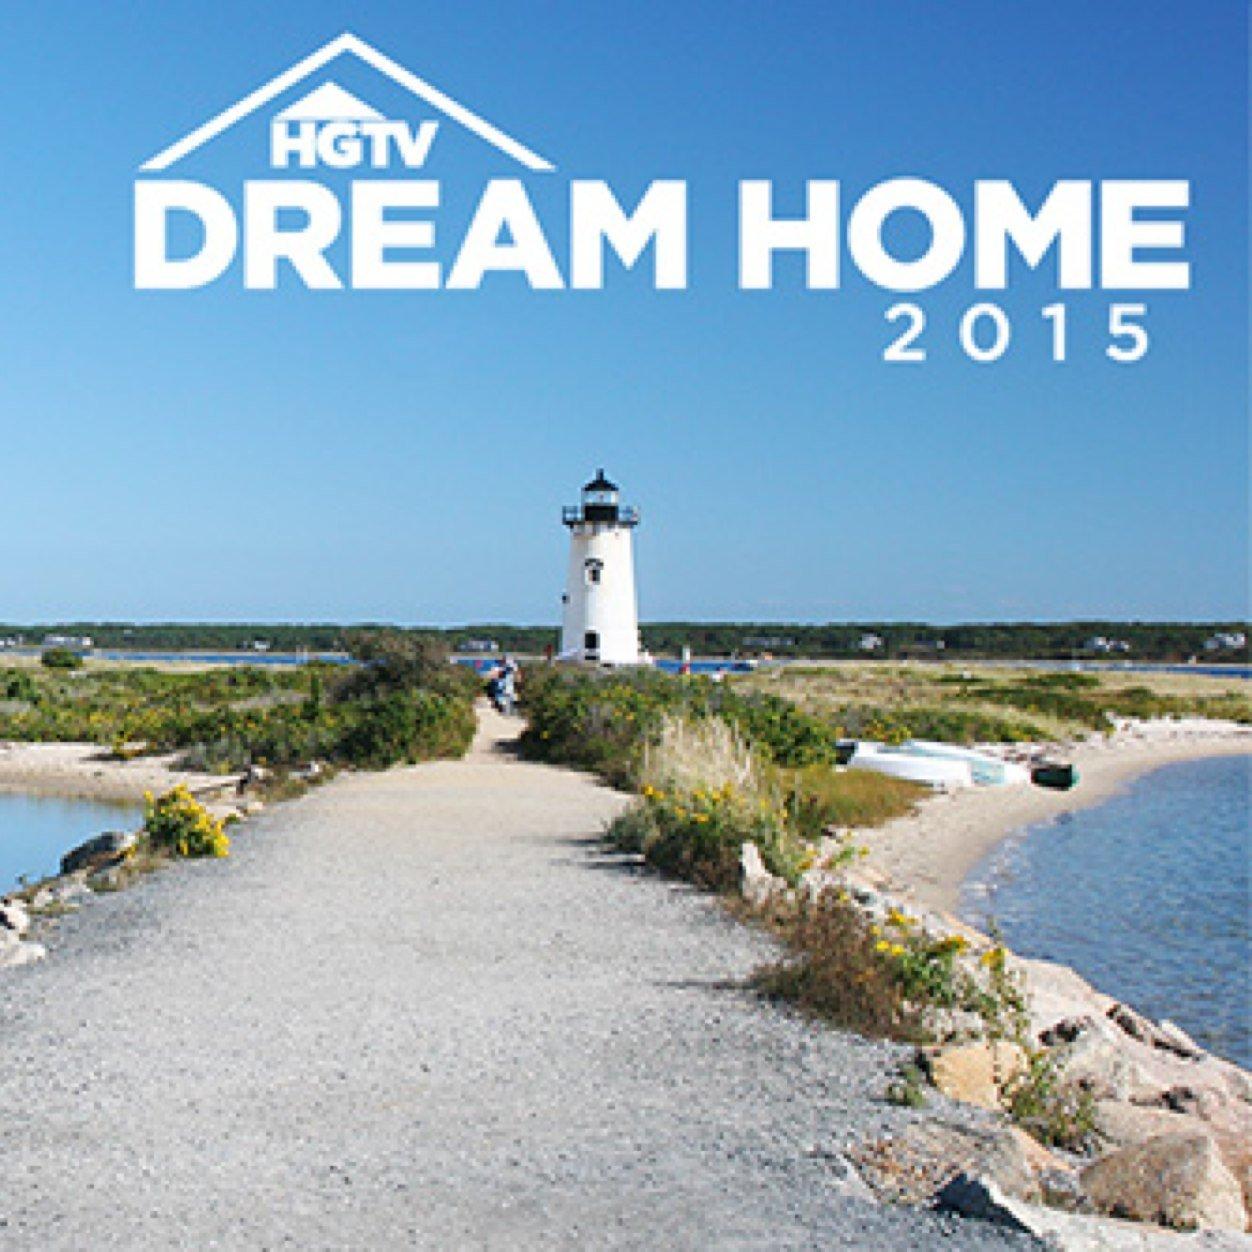 Hgtv Dream Home 2015: Twitter / Account Suspended